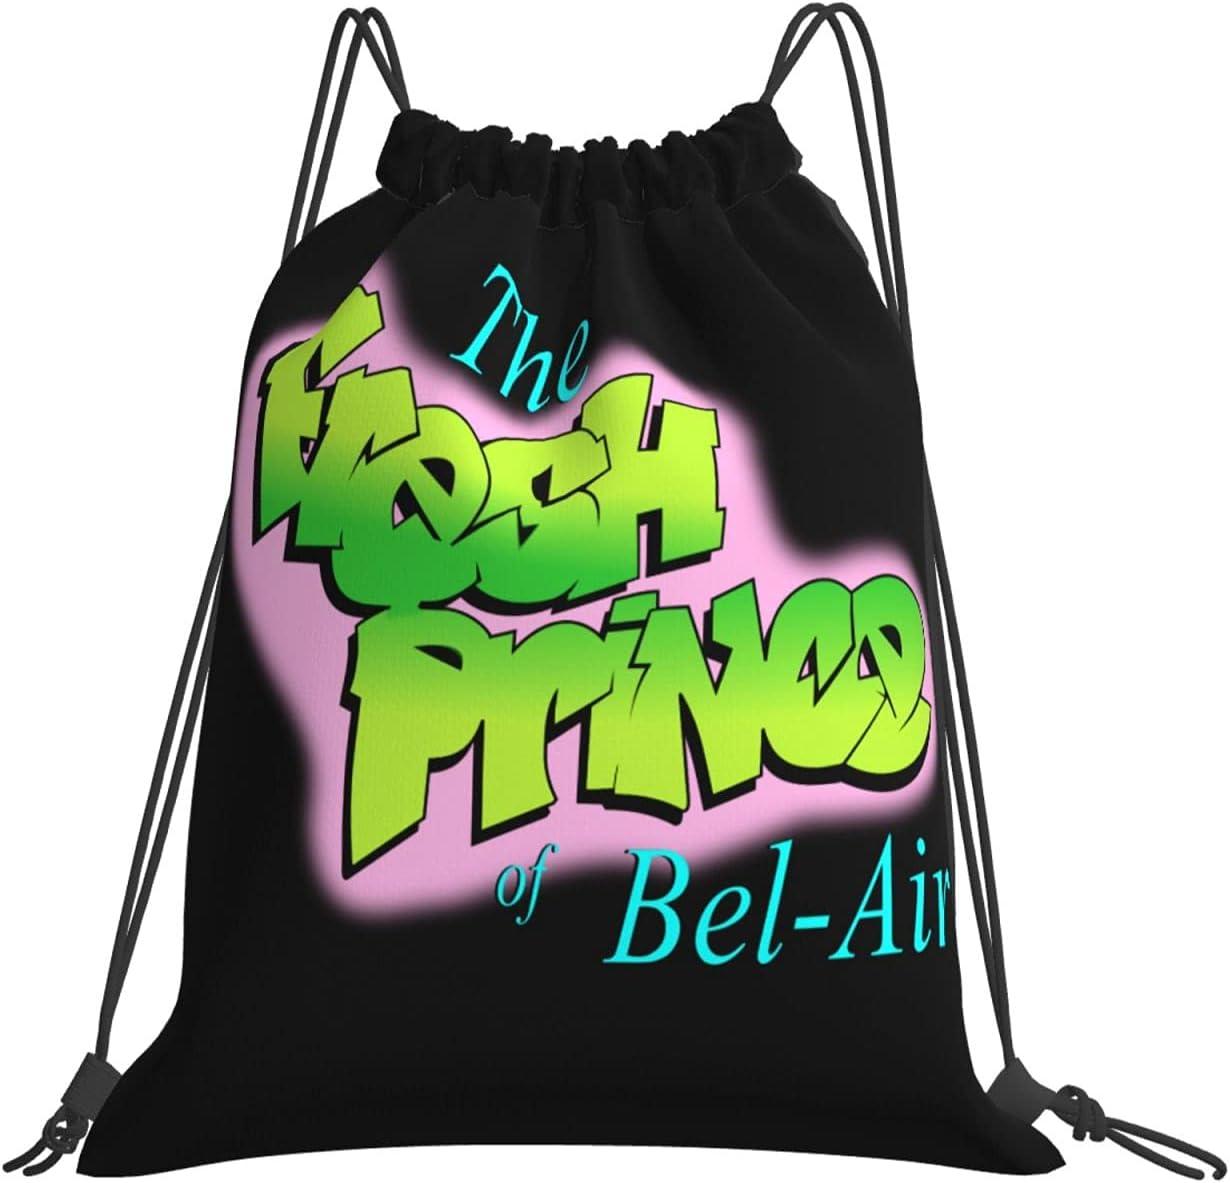 The Fresh Prince Of Bel-Air Drawstring Dye Large Super-cheap Tie Ru Backpack Very popular